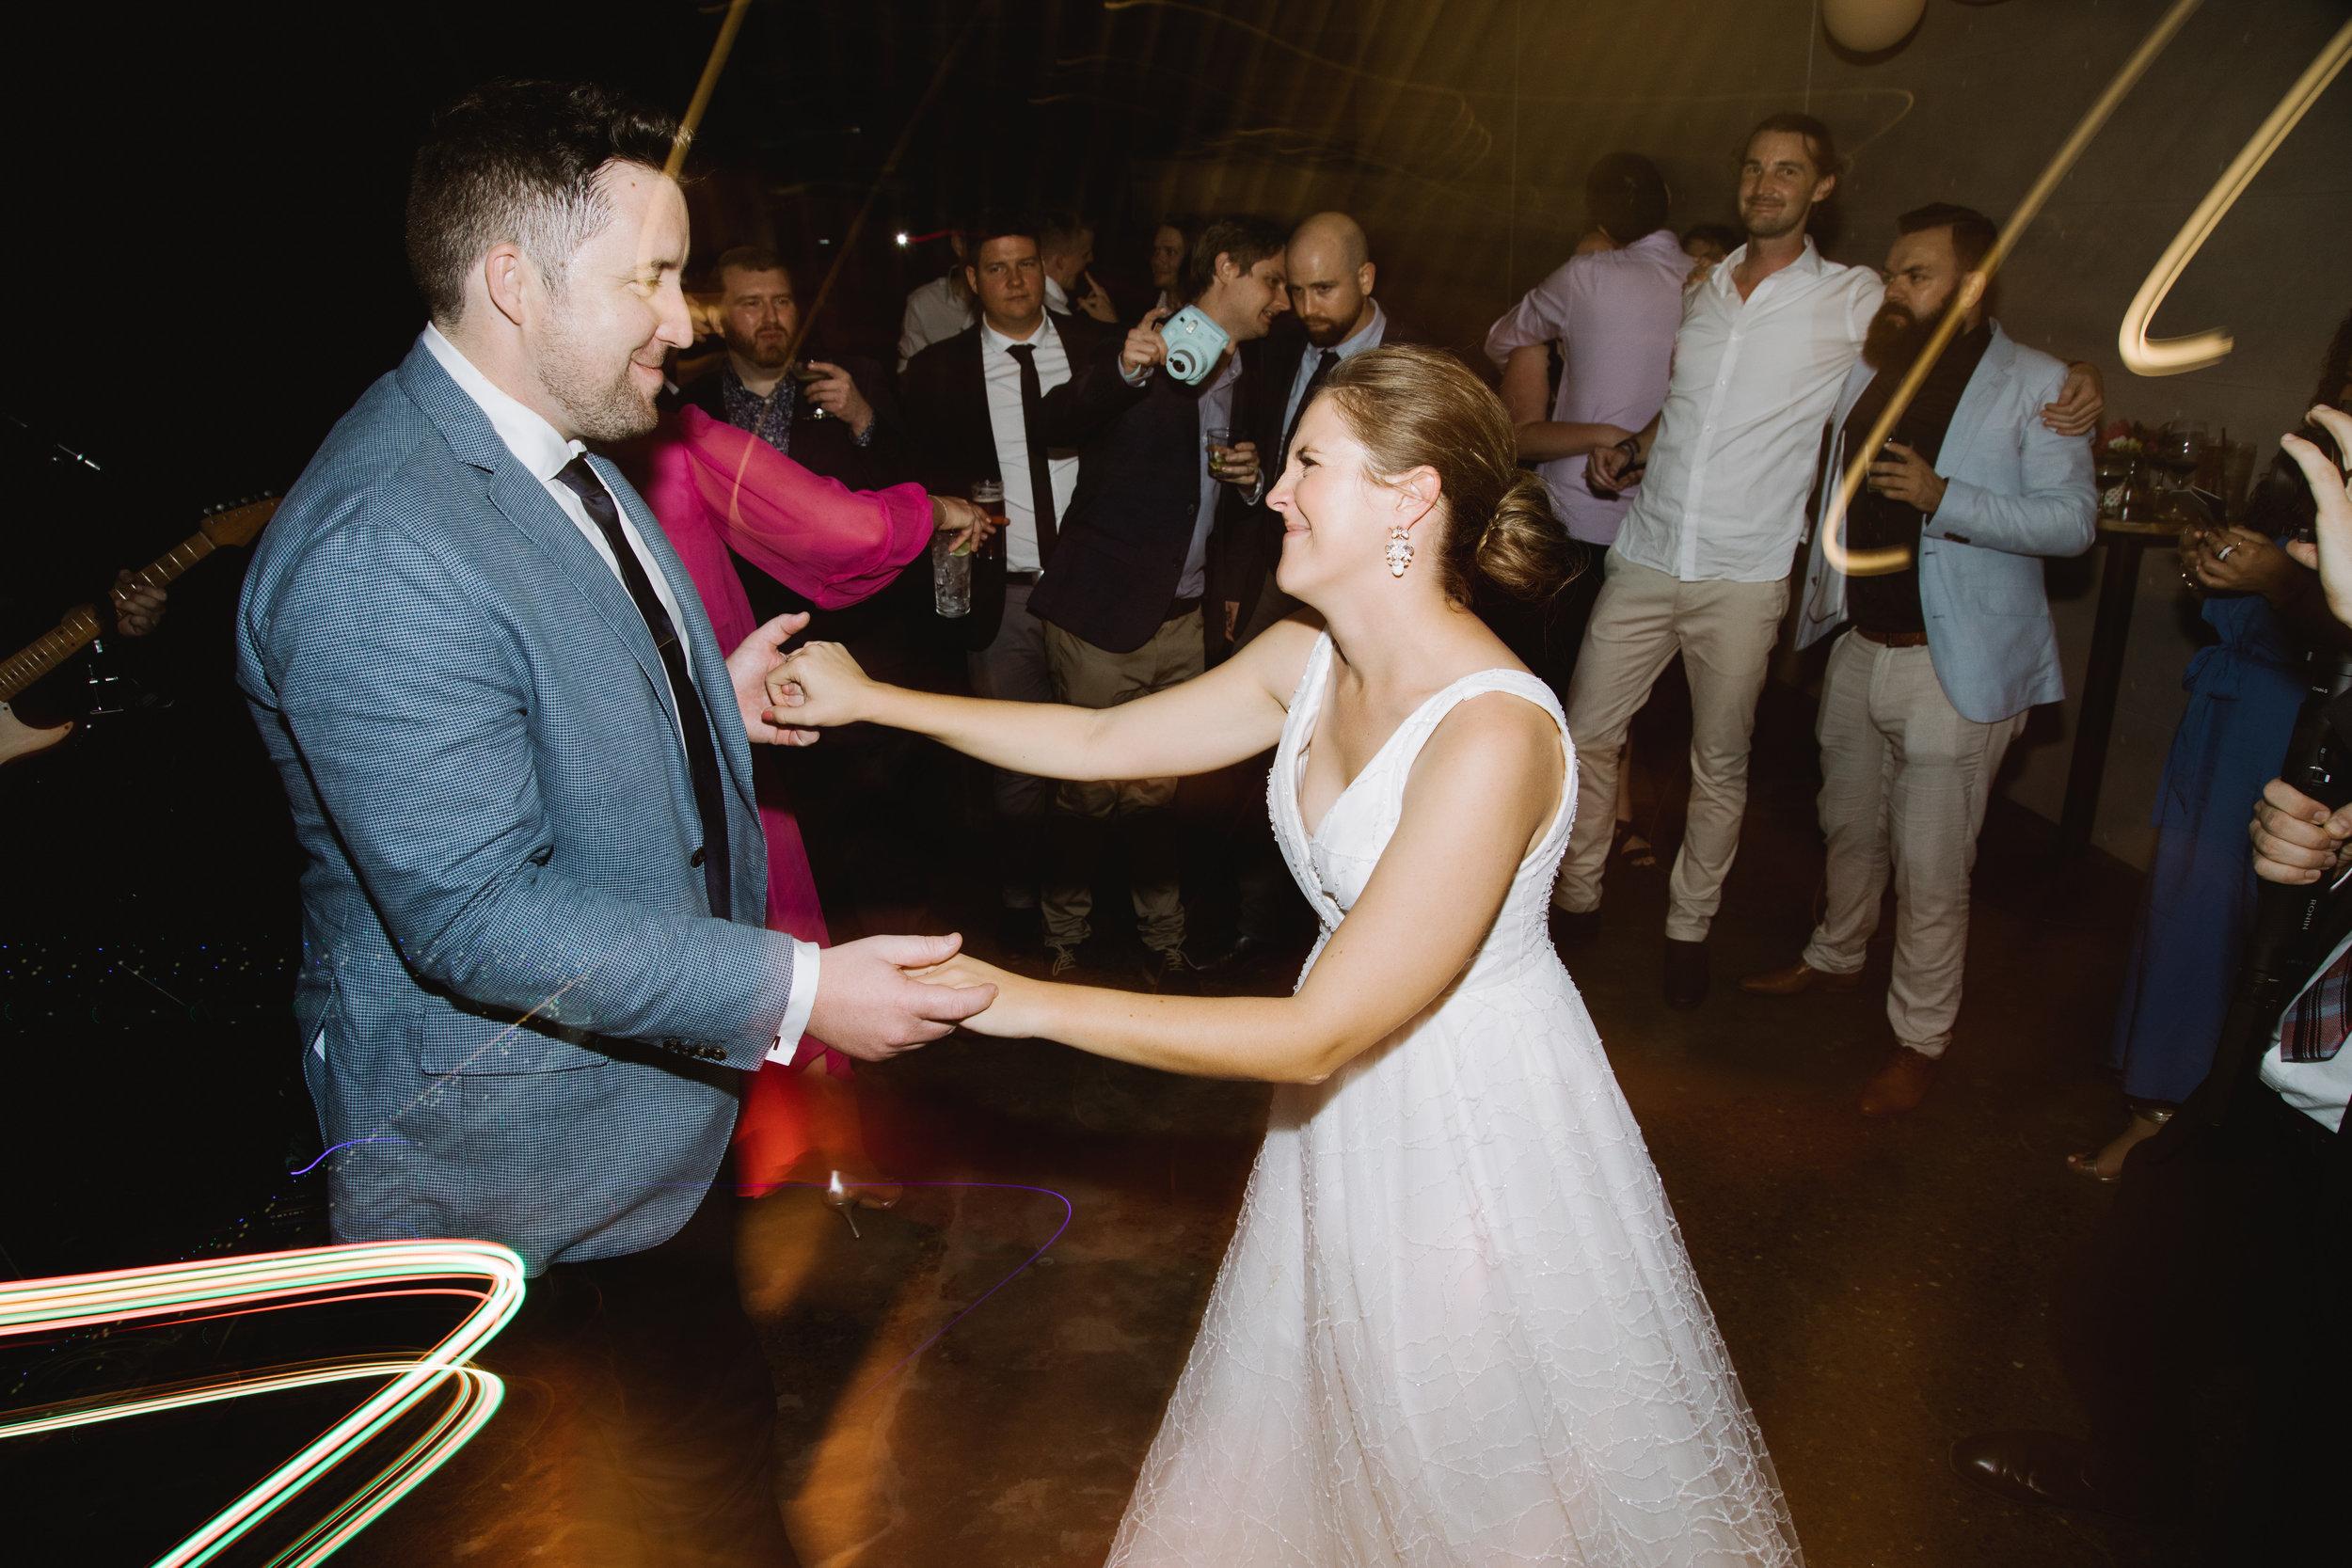 refinery-brisbane-wedding-reception-21.jpg